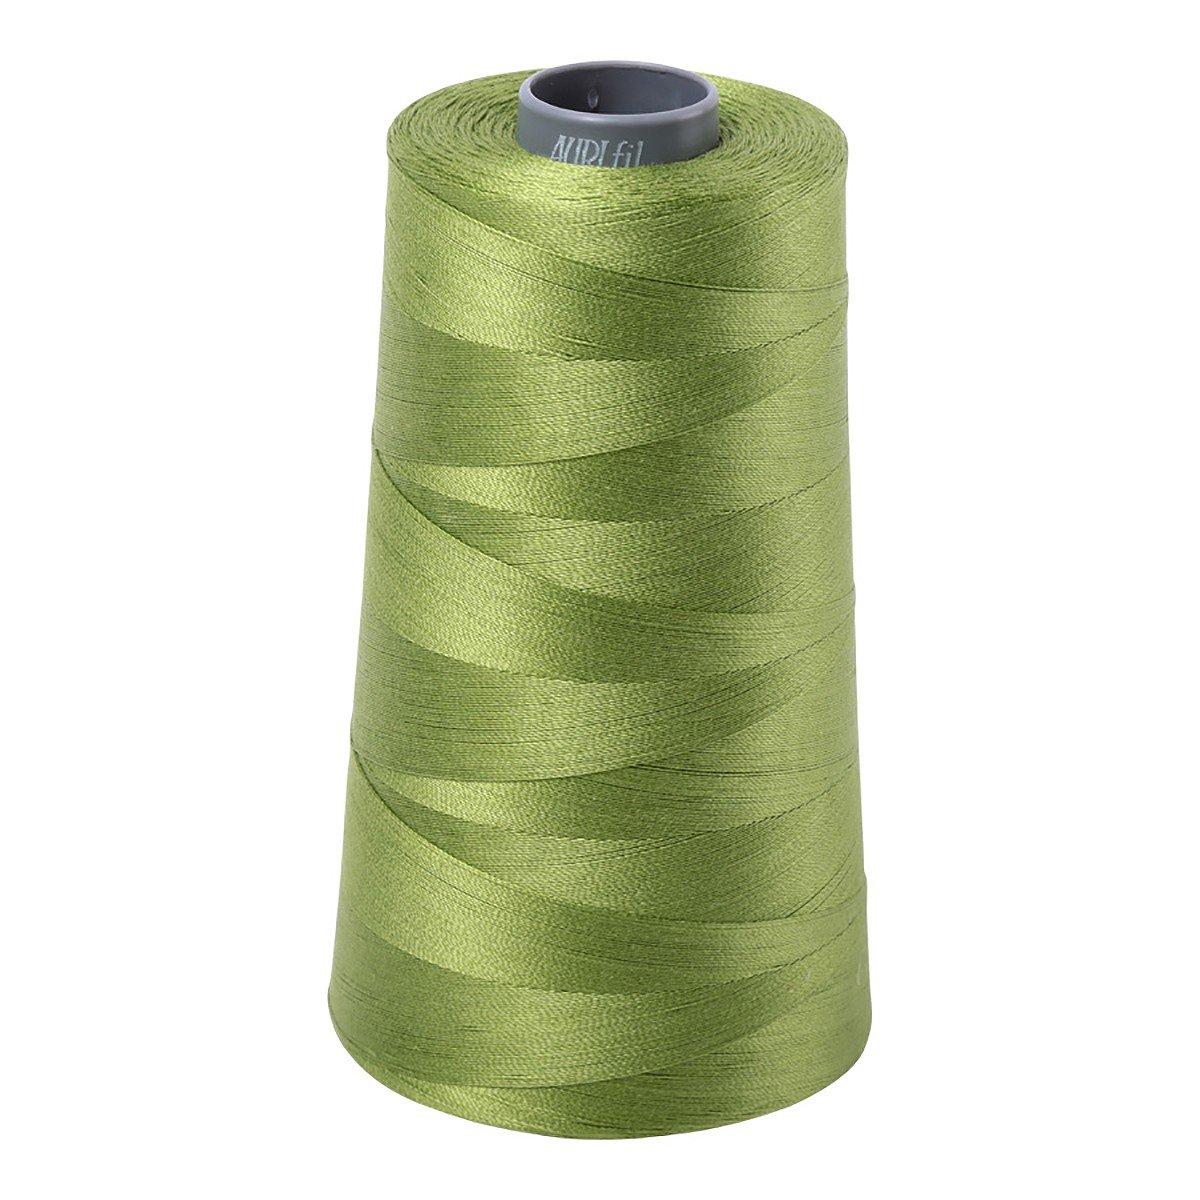 Mako (Cotton) Embroidery Thread 28wt 3609yds Fern Green